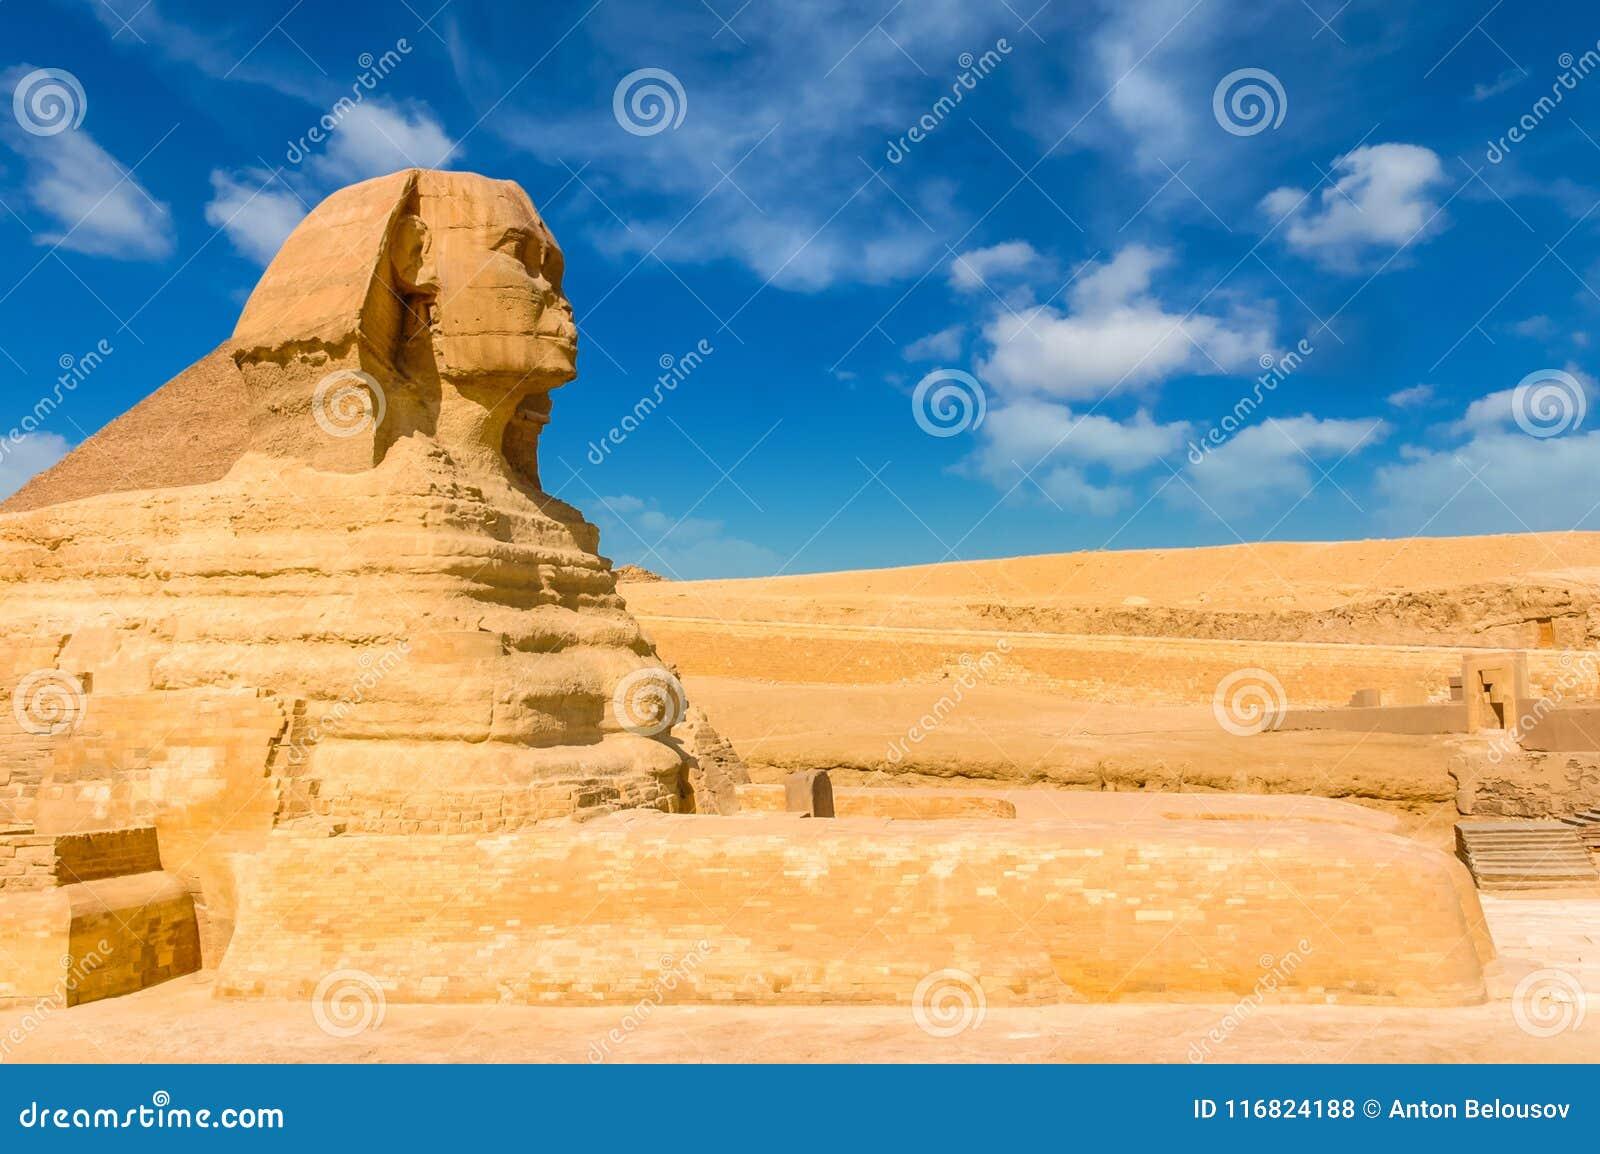 Egyptische sfinx kaïro giza Egypte De achtergrond van de reis Architec